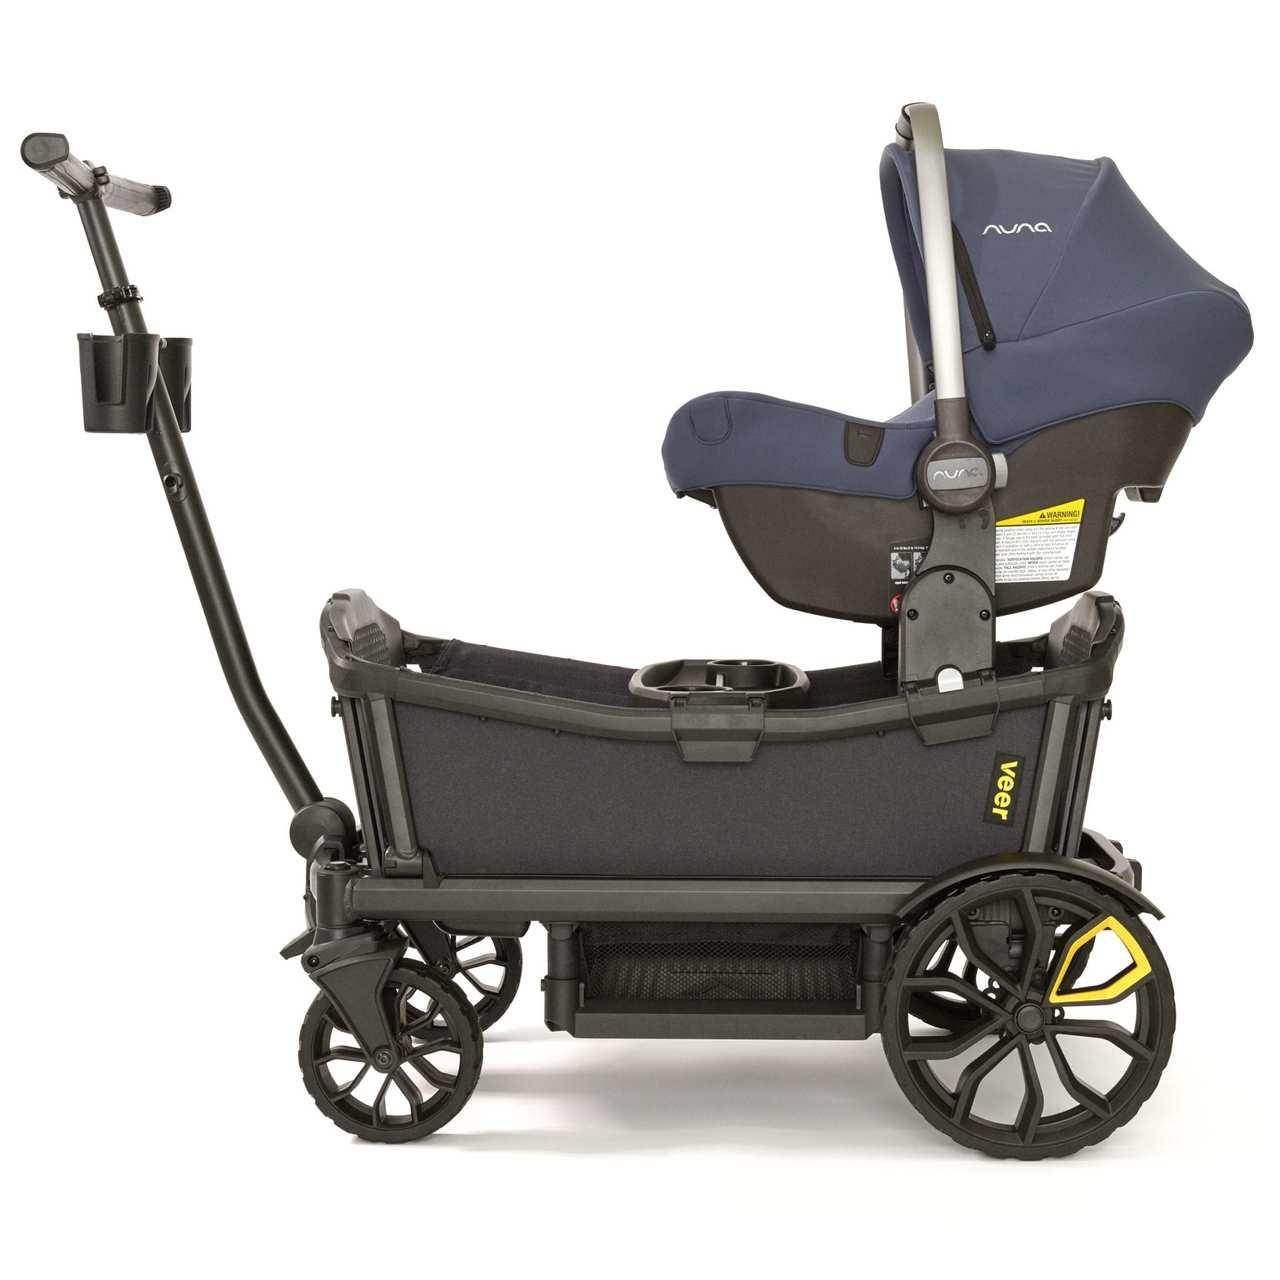 veer Veer Infant Car Seat Adapter Clek/Cybex/MaxiCosi/Nuna